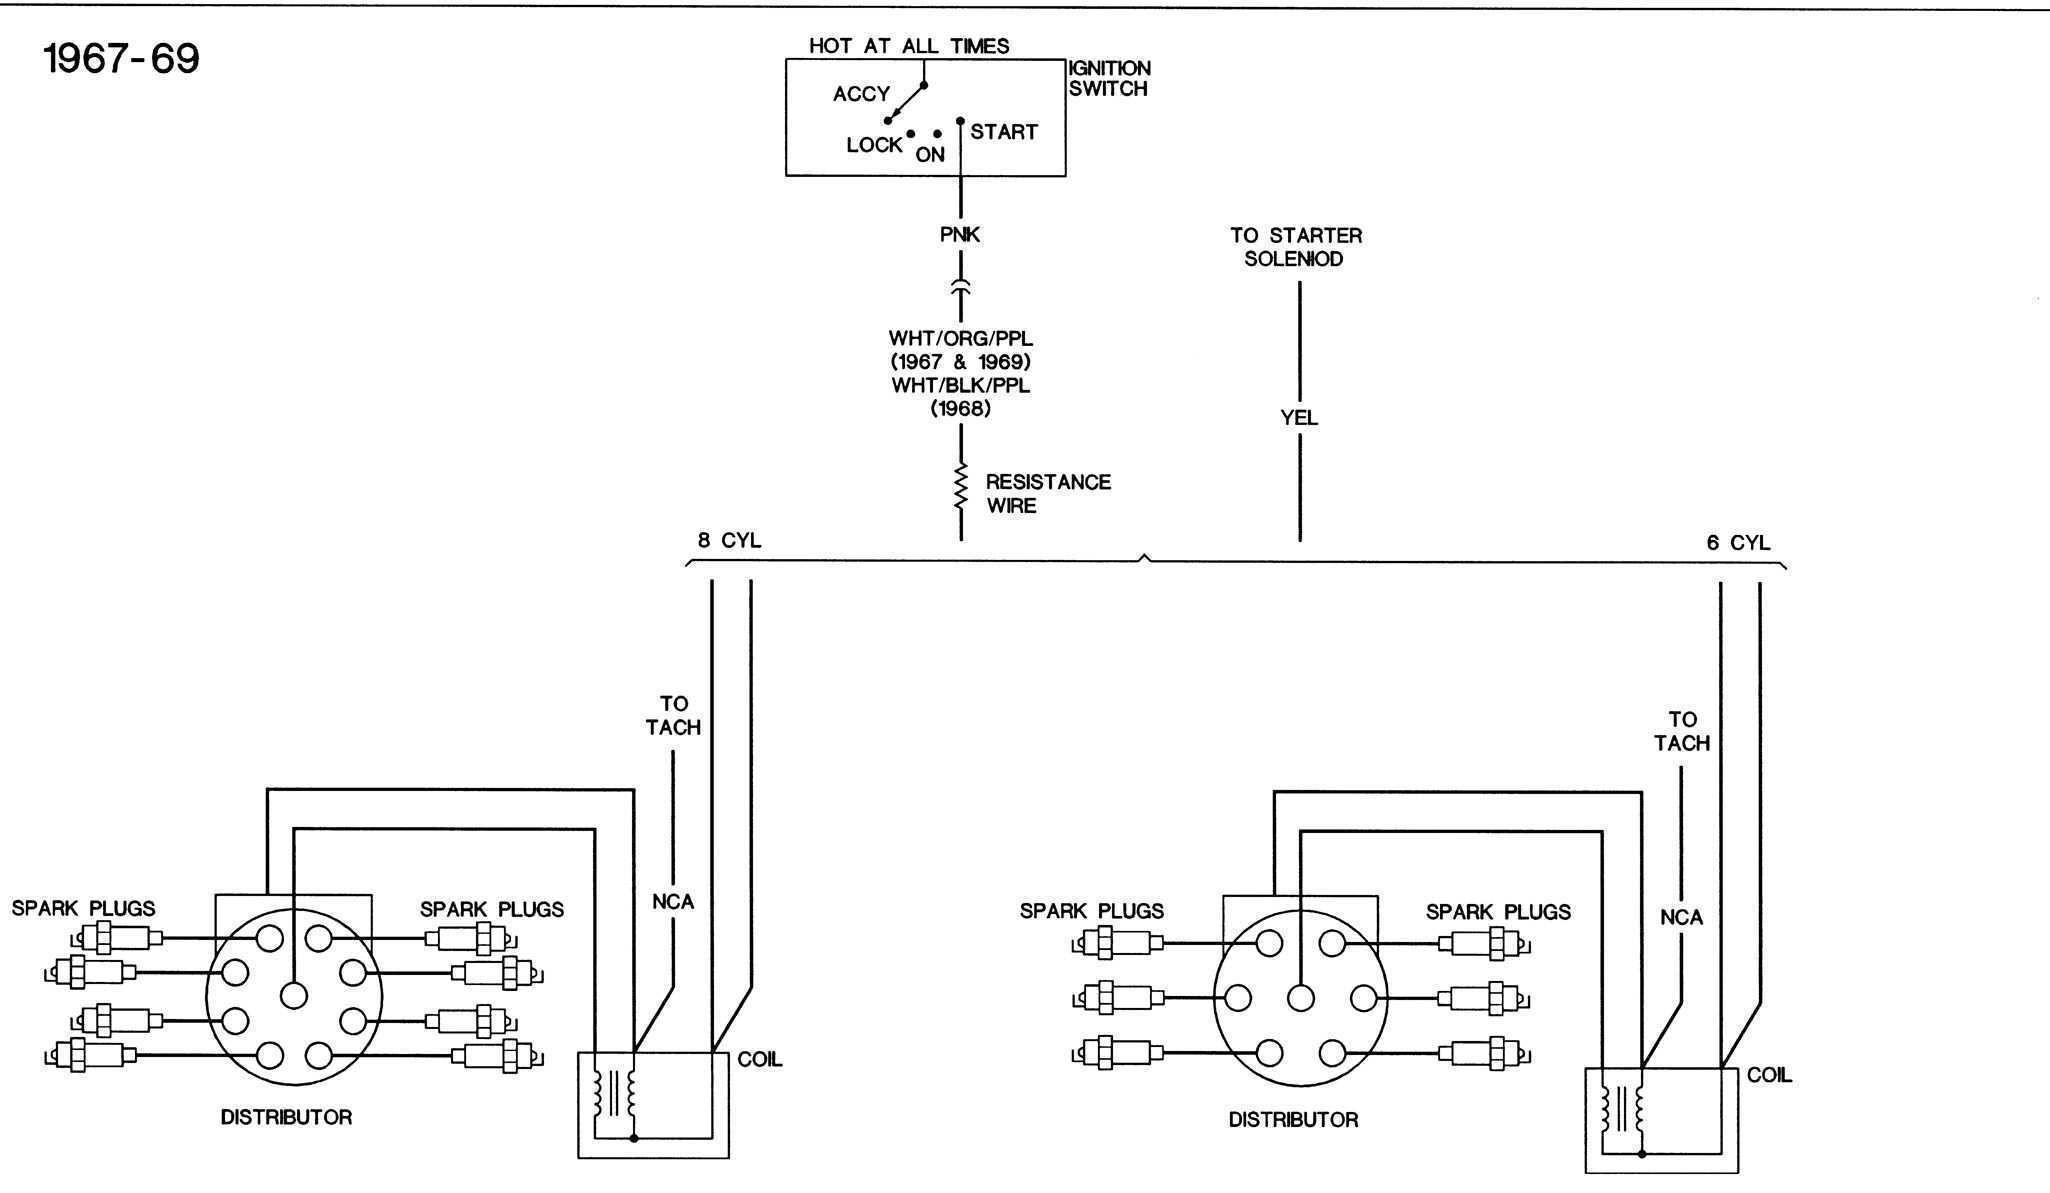 Sunpro Super Tach 2 Wiring Diagram Awesome Stunning Sunpro Rh thespartanchronicle